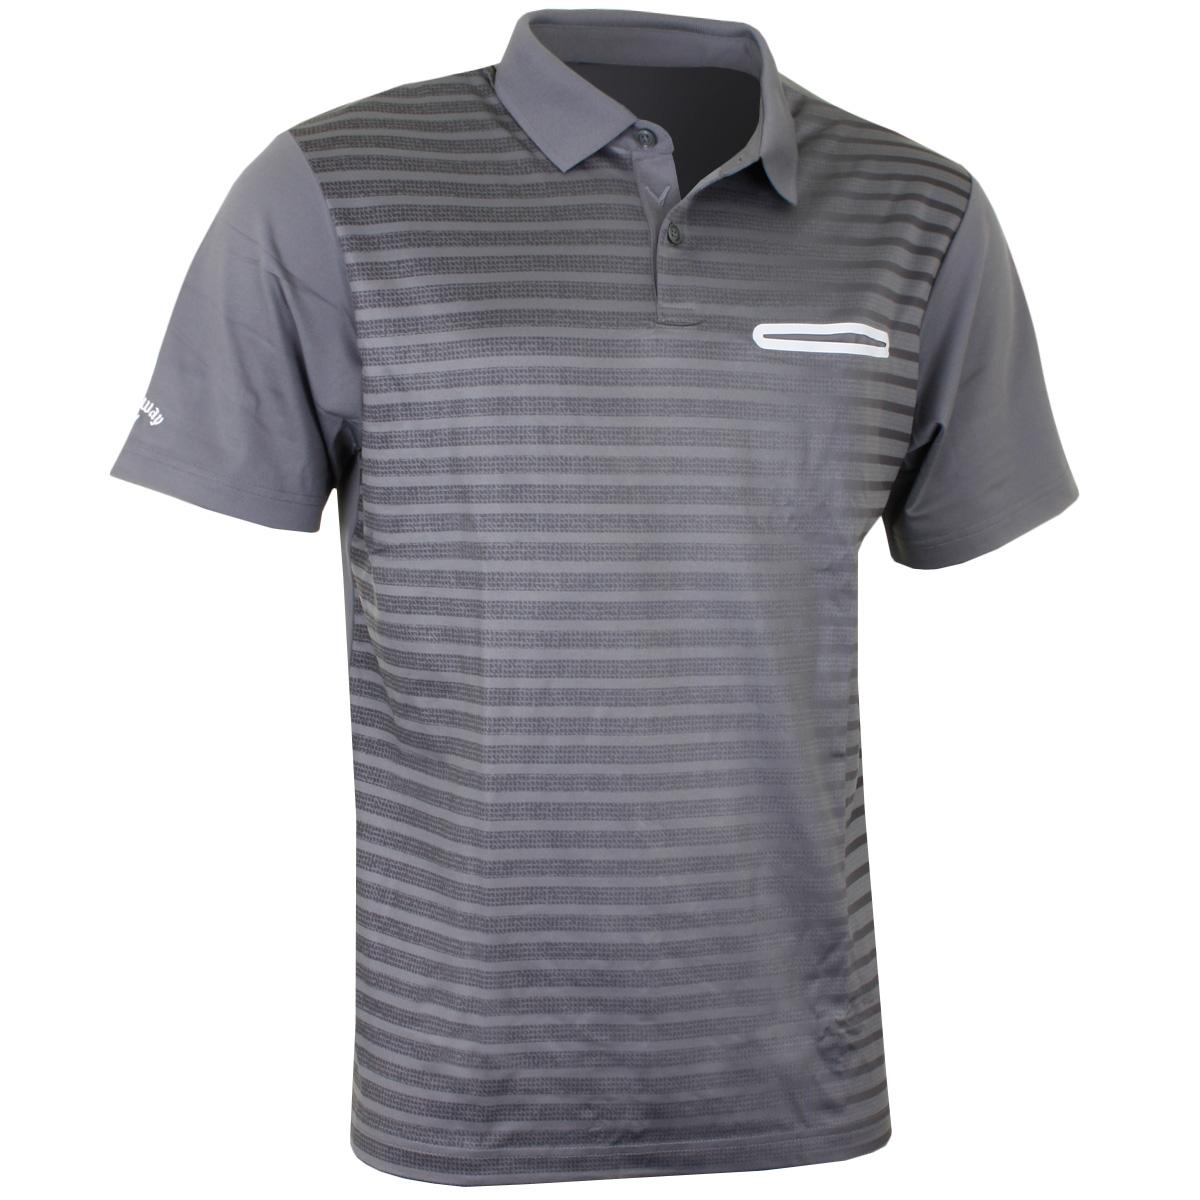 Callaway Golf 2017 Mens Ombre Pocket Opti Dri Stretch Tech